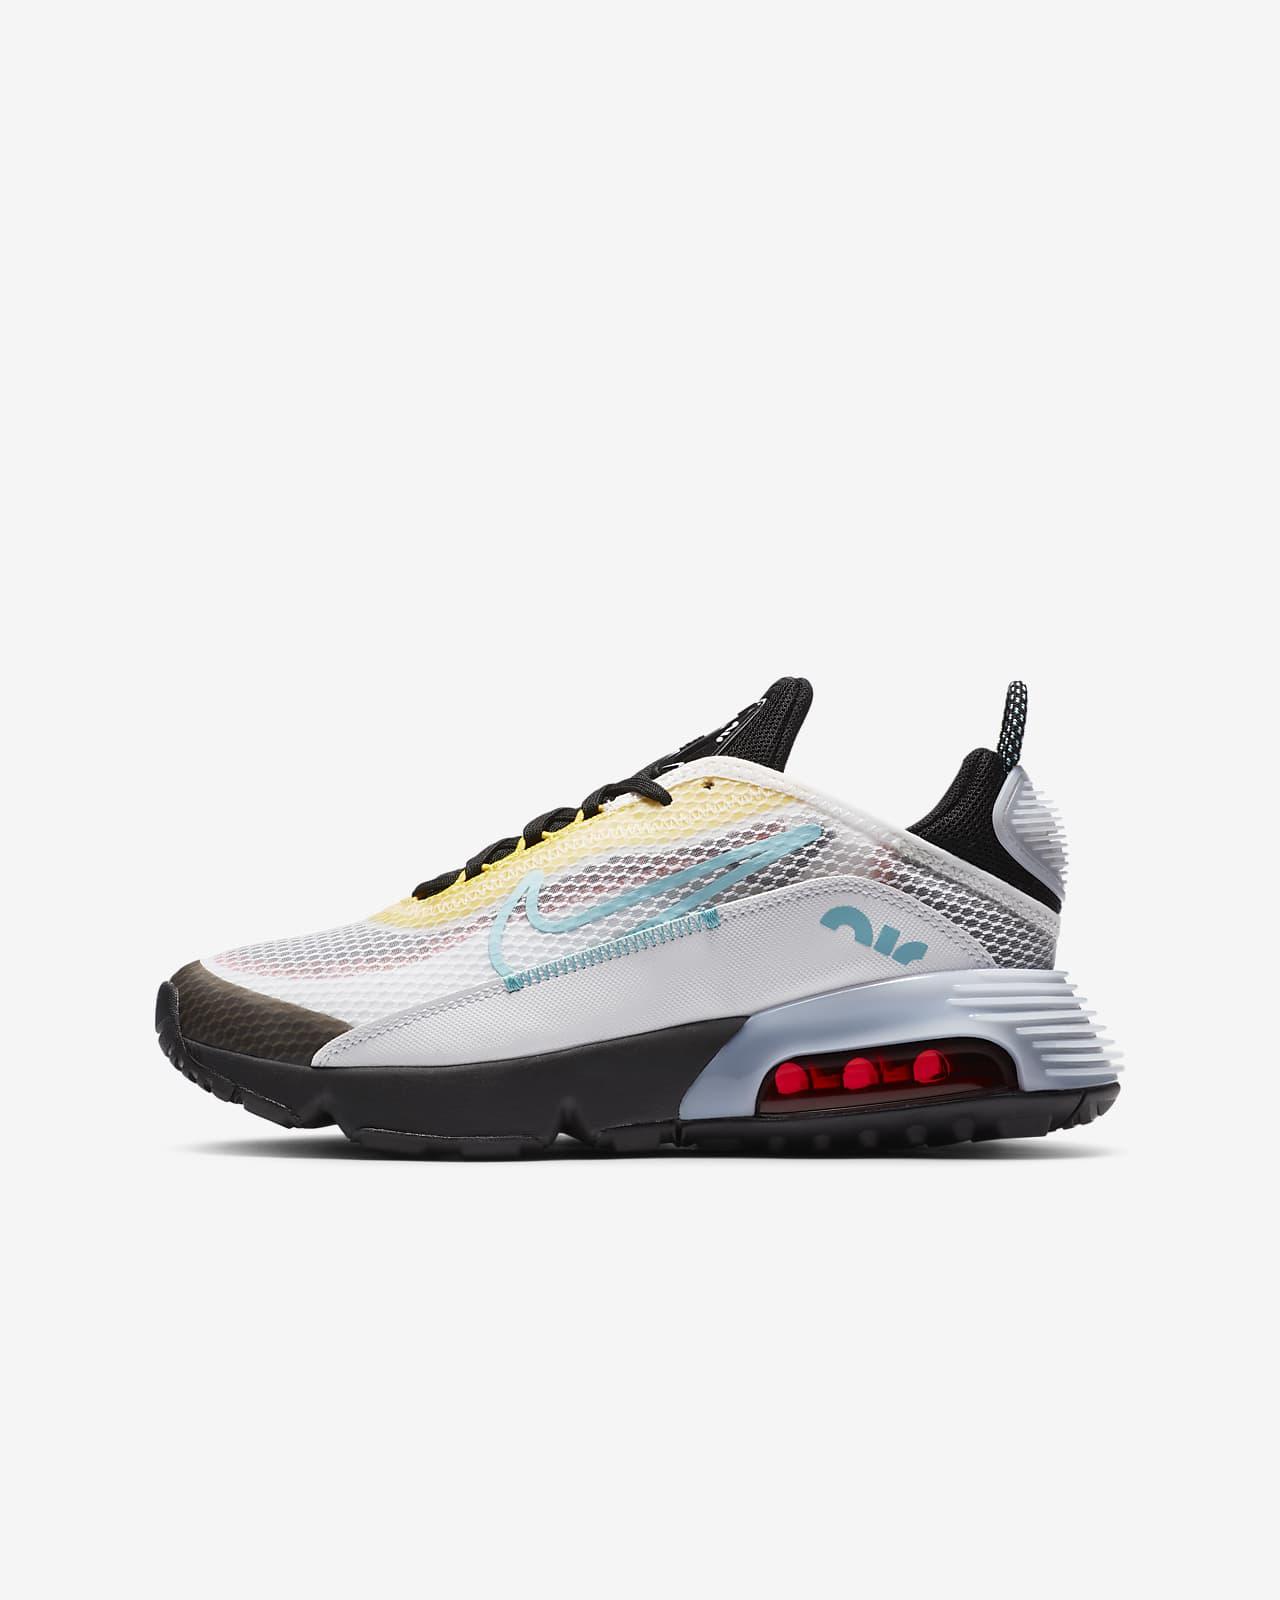 Nike Air Max 2090 Older Kids' Shoes. Nike LU